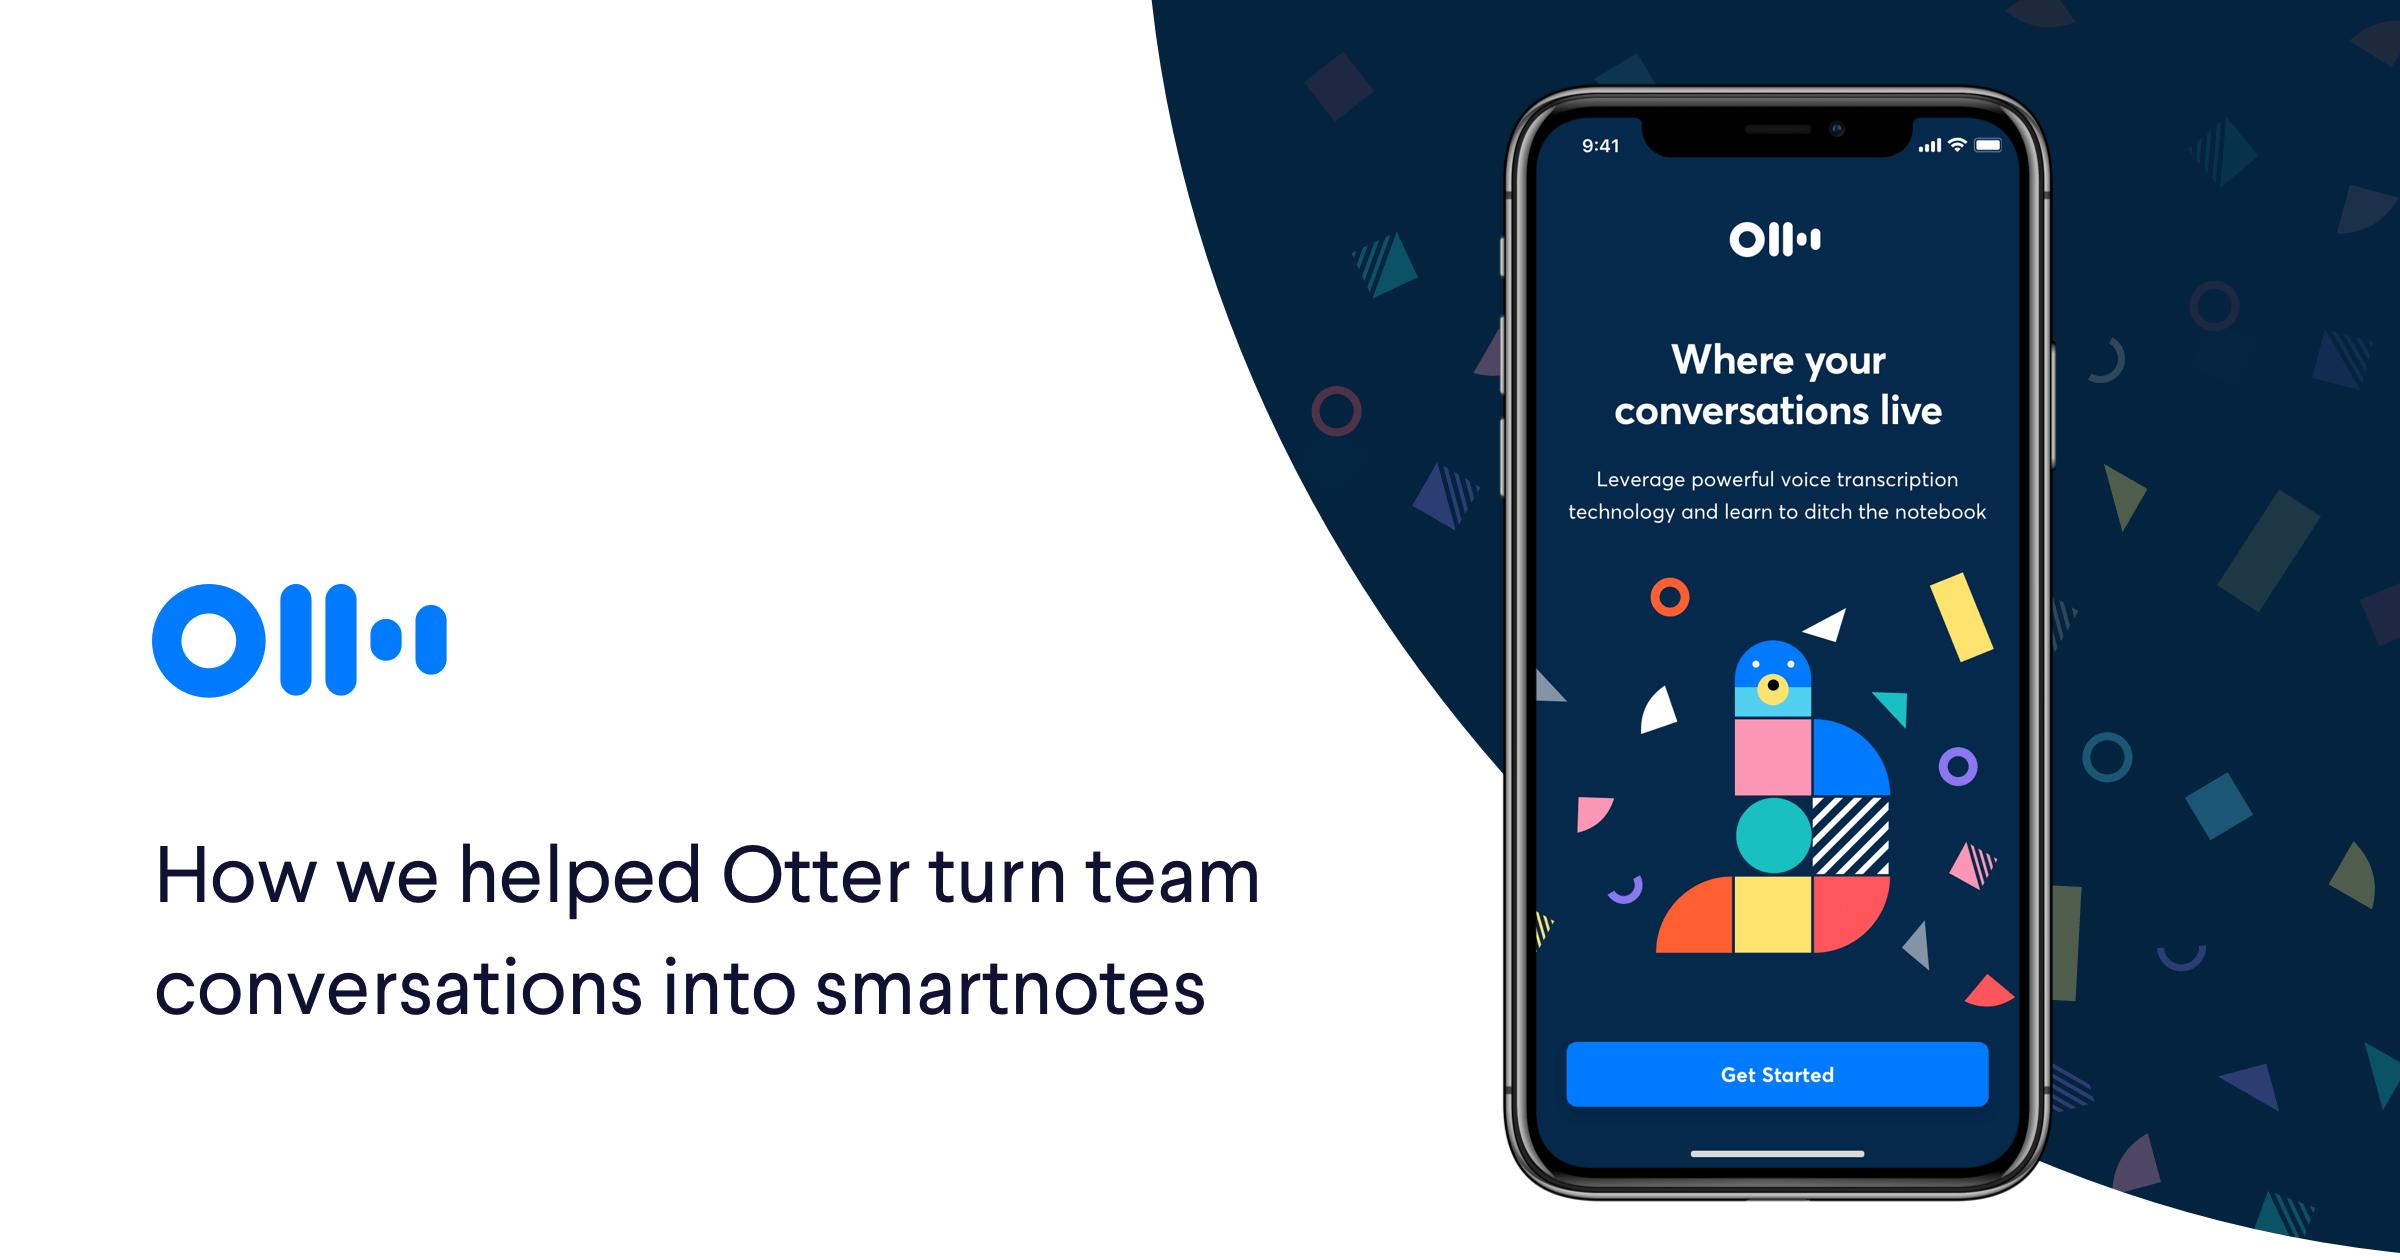 Otter UI Design Case Study